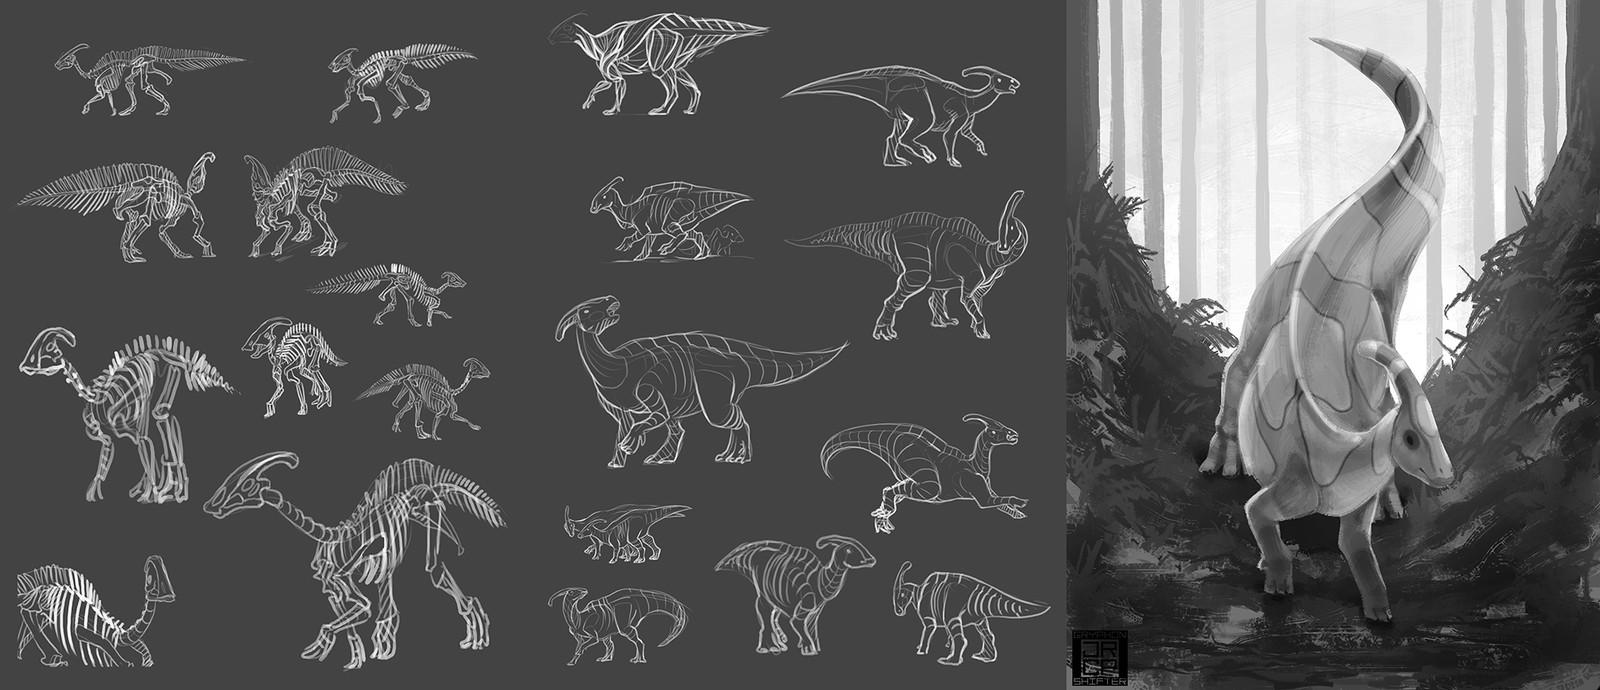 3: Parasaurolophus